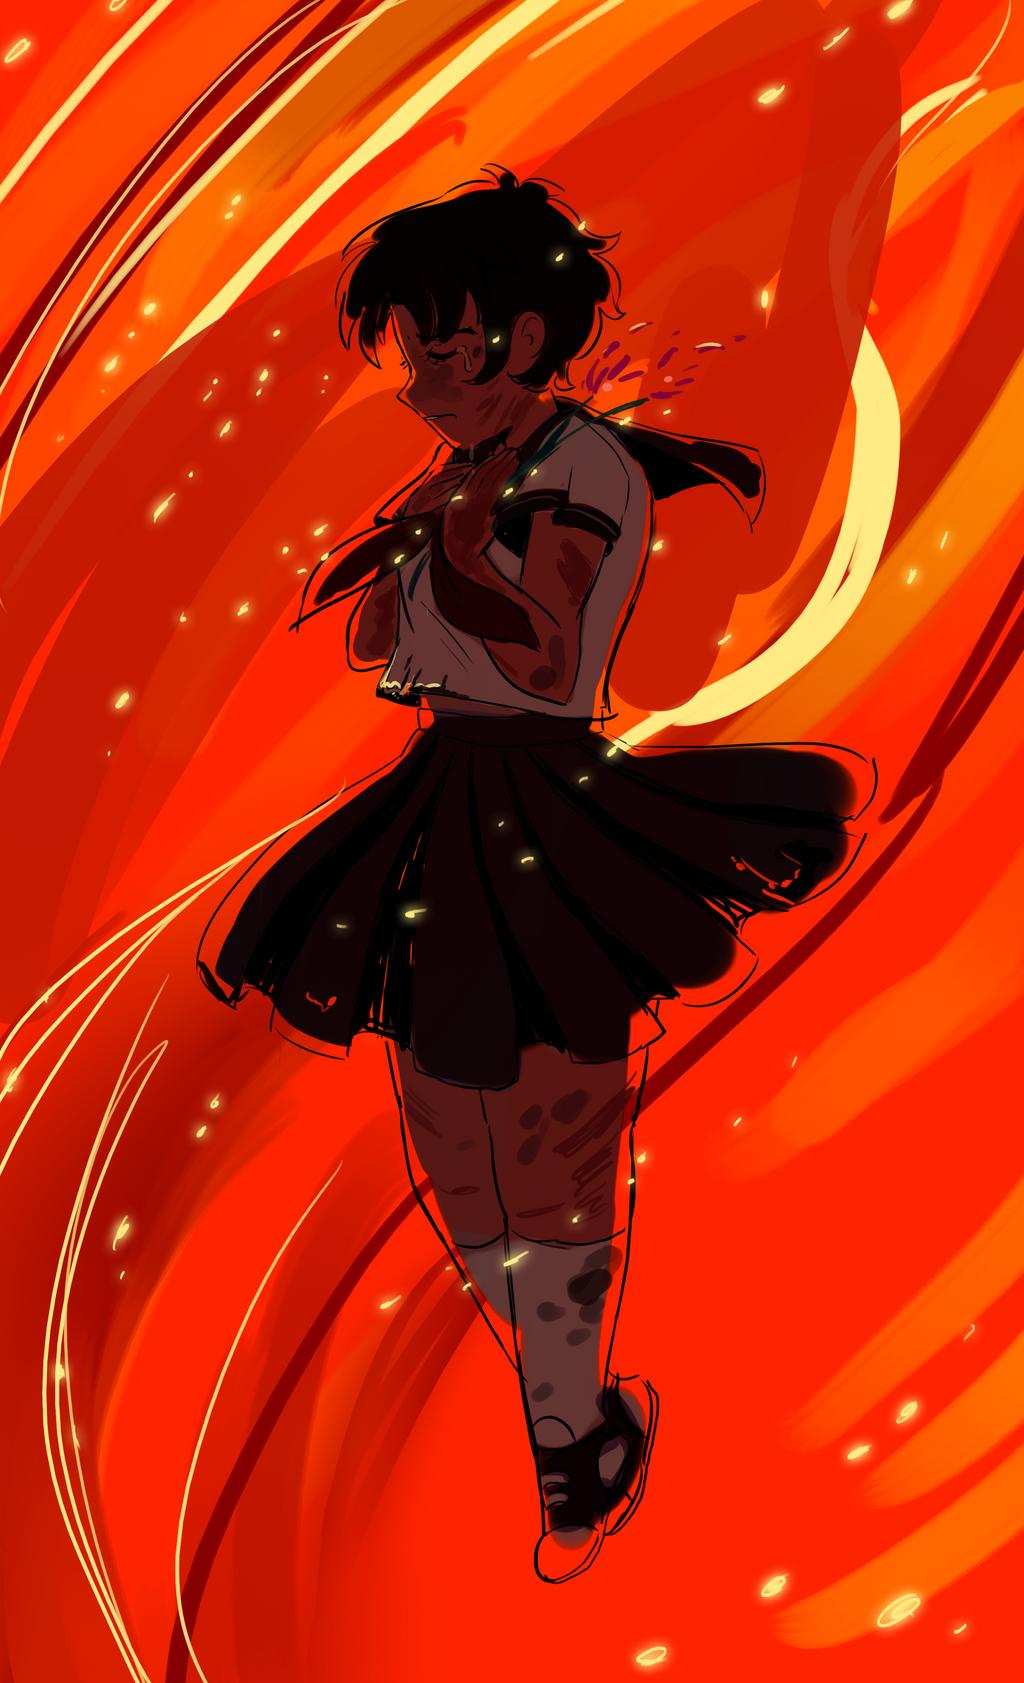 Burning by hokoki